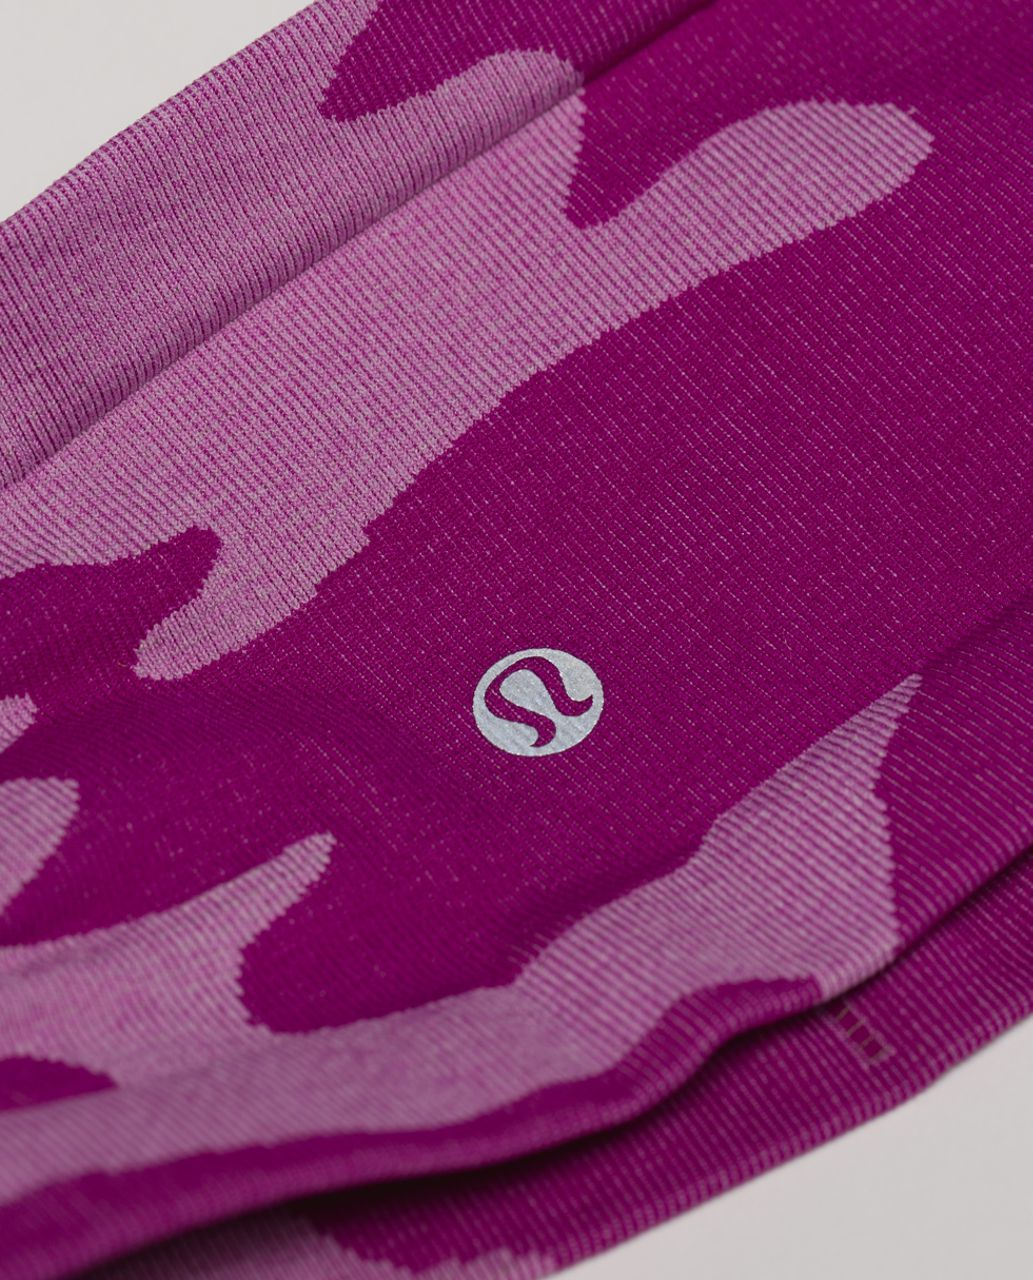 Lululemon Bangs Back Headwrap - Heathered Ultra Violet